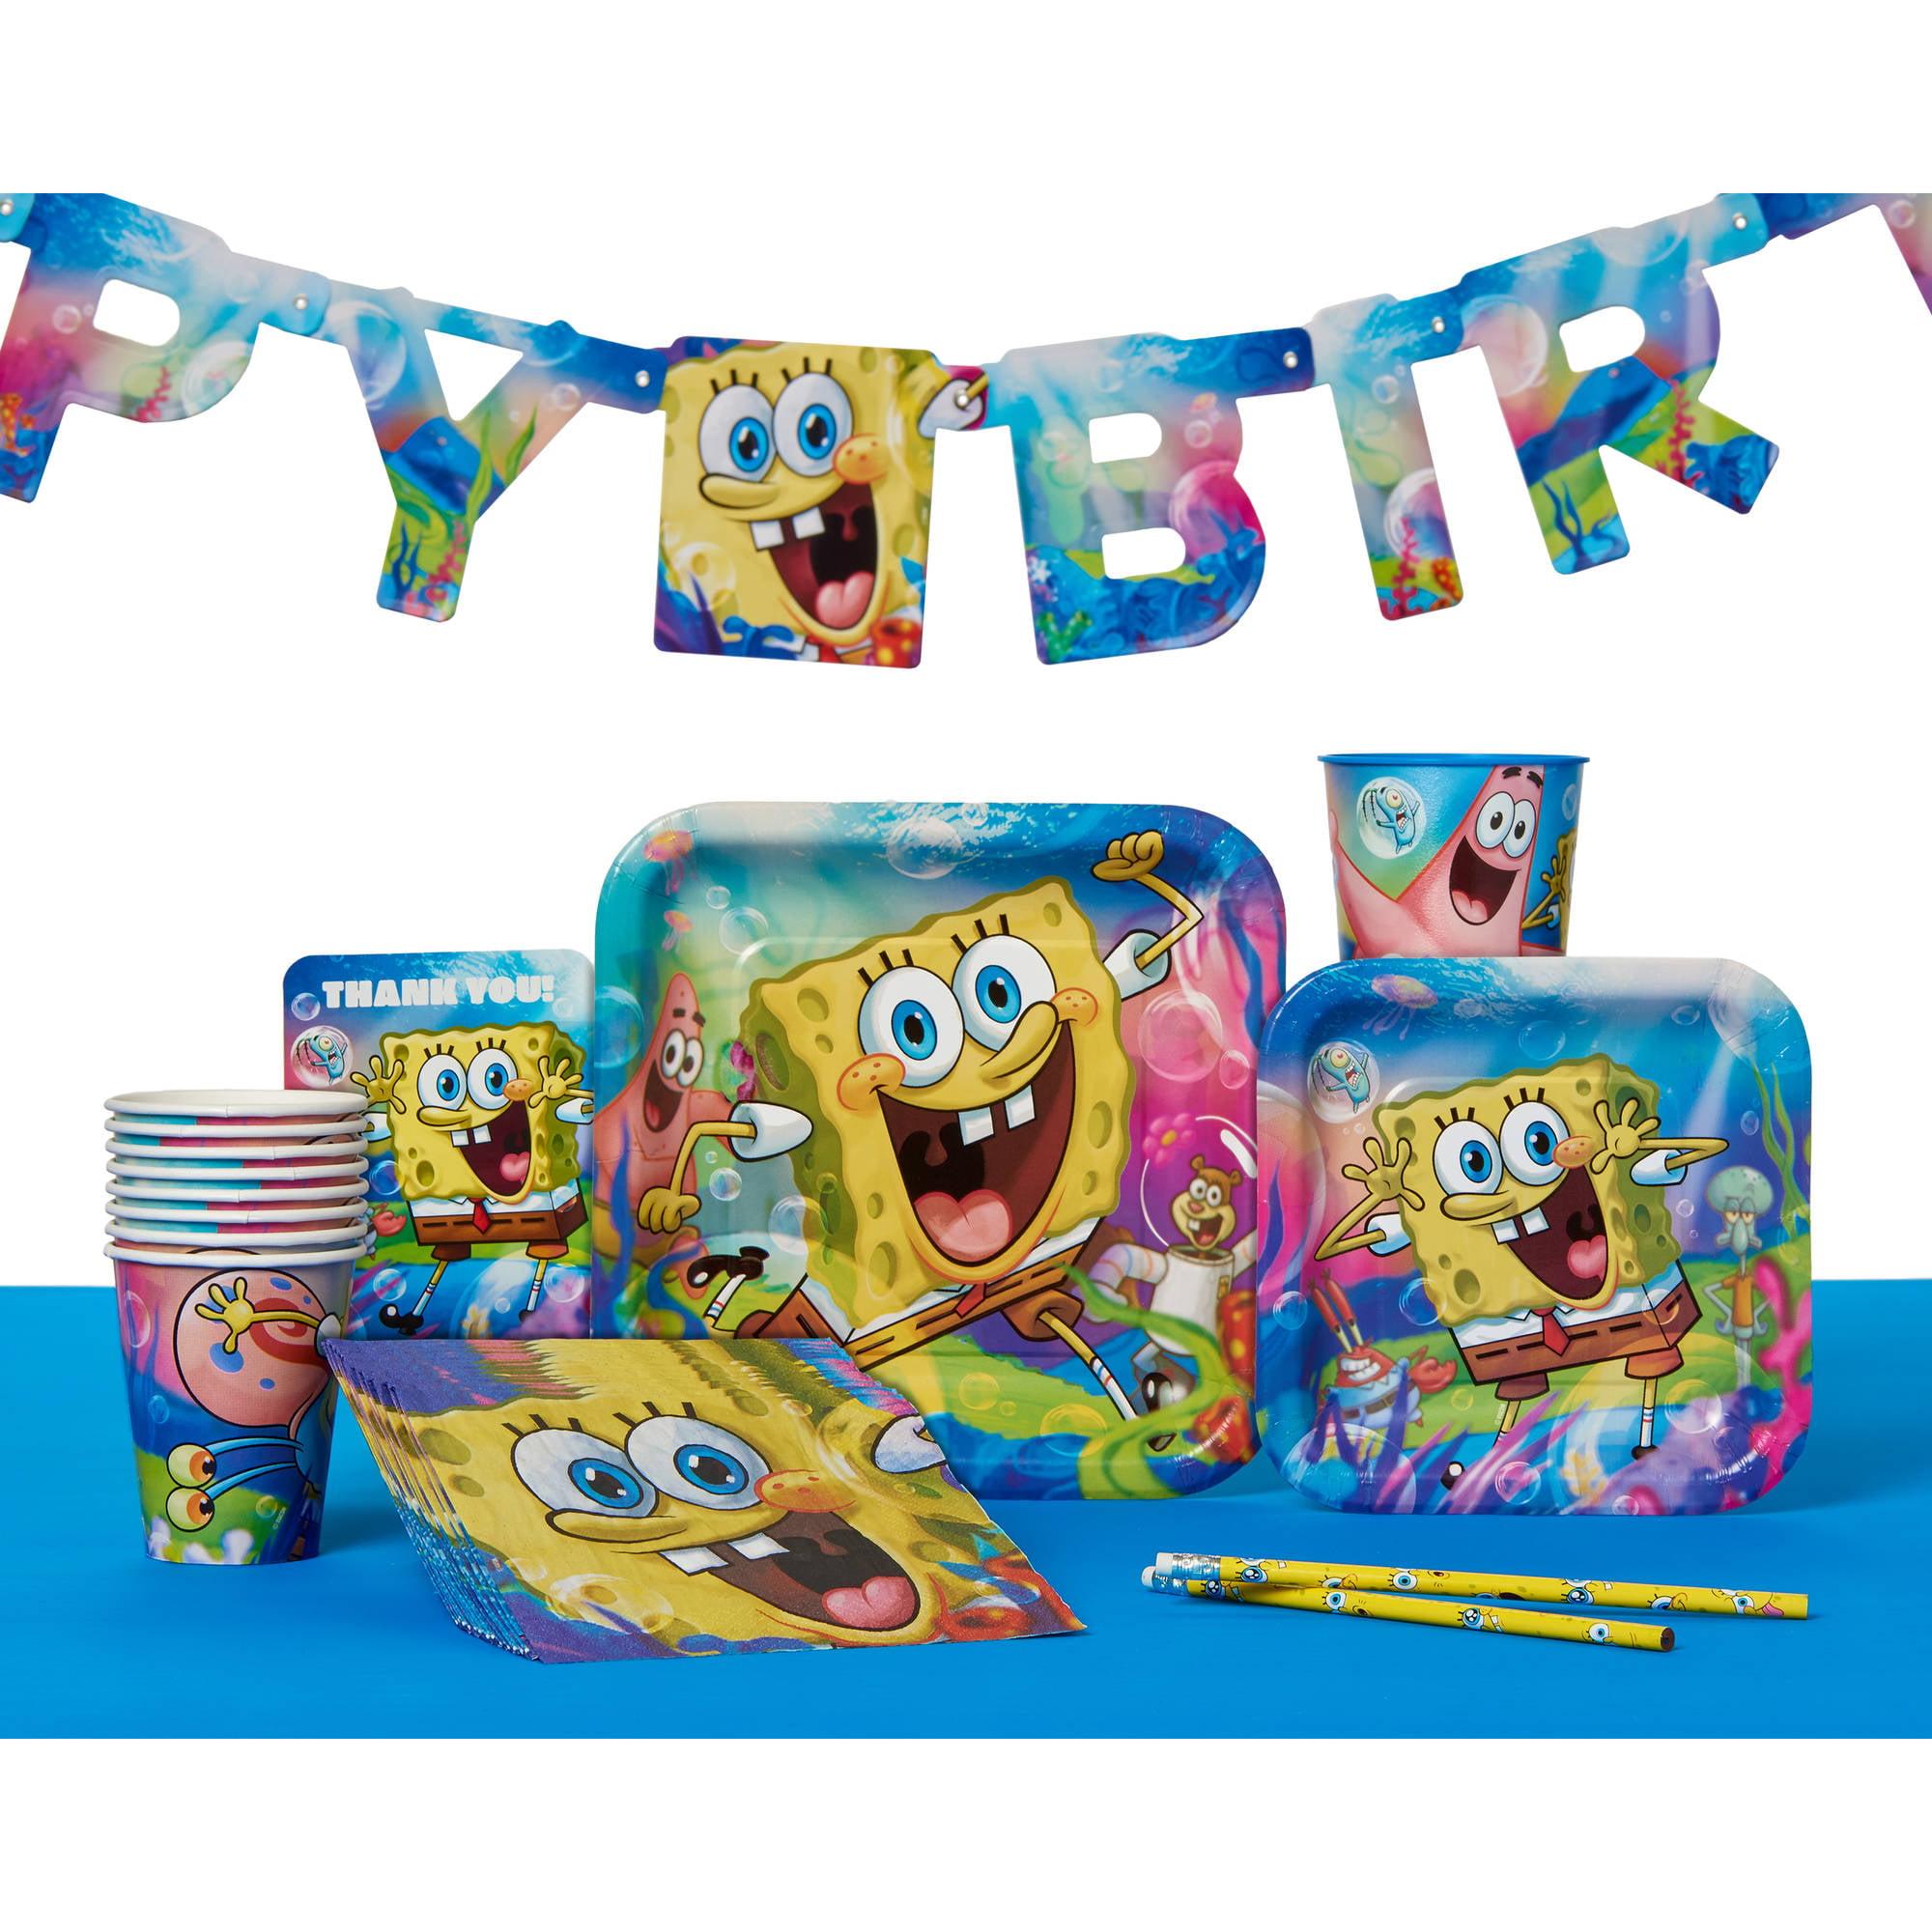 SpongeBob SquarePants Party Supplies